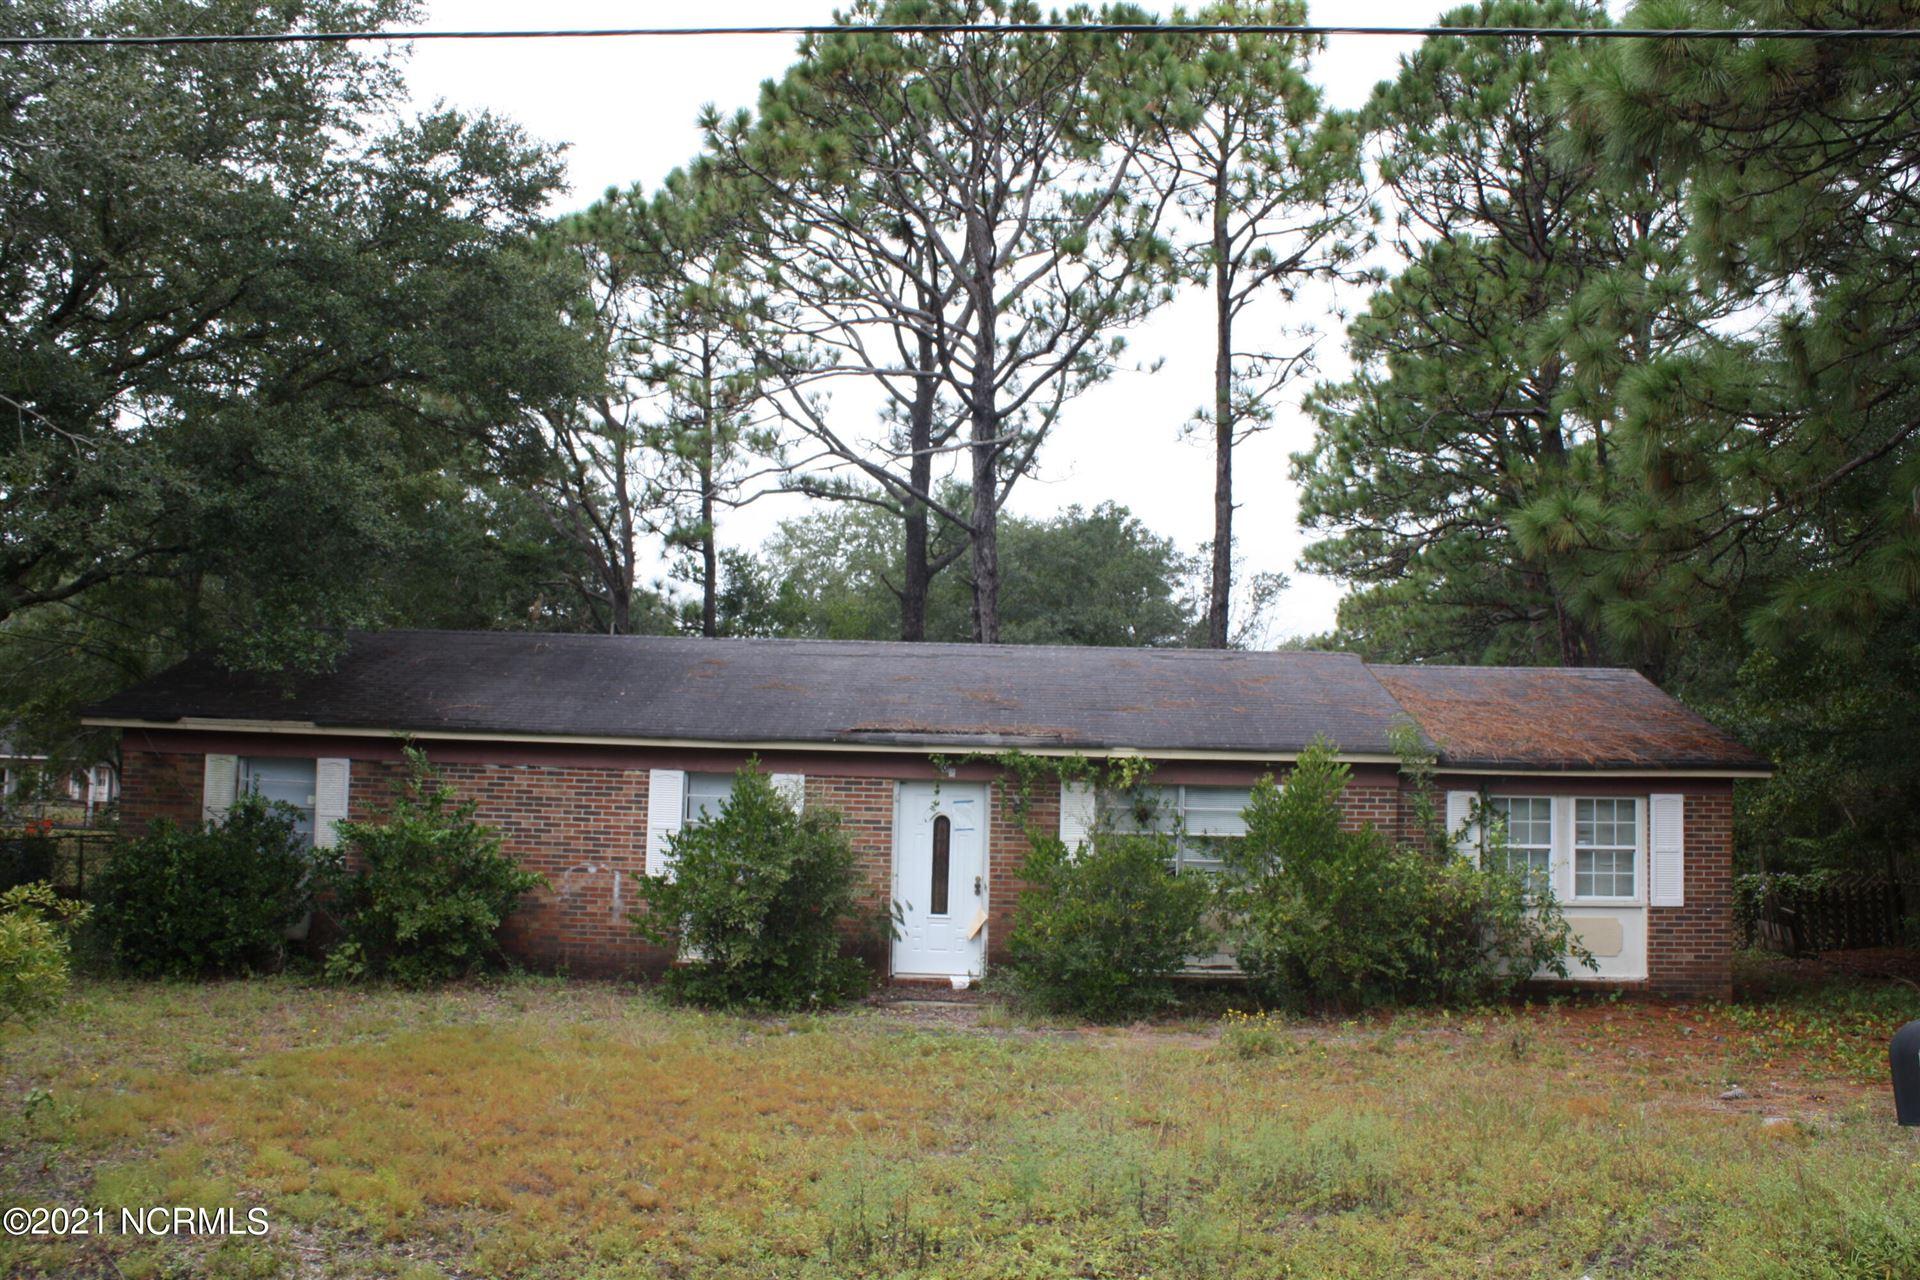 Photo of 502 Beasley Road, Wilmington, NC 28409 (MLS # 100291919)